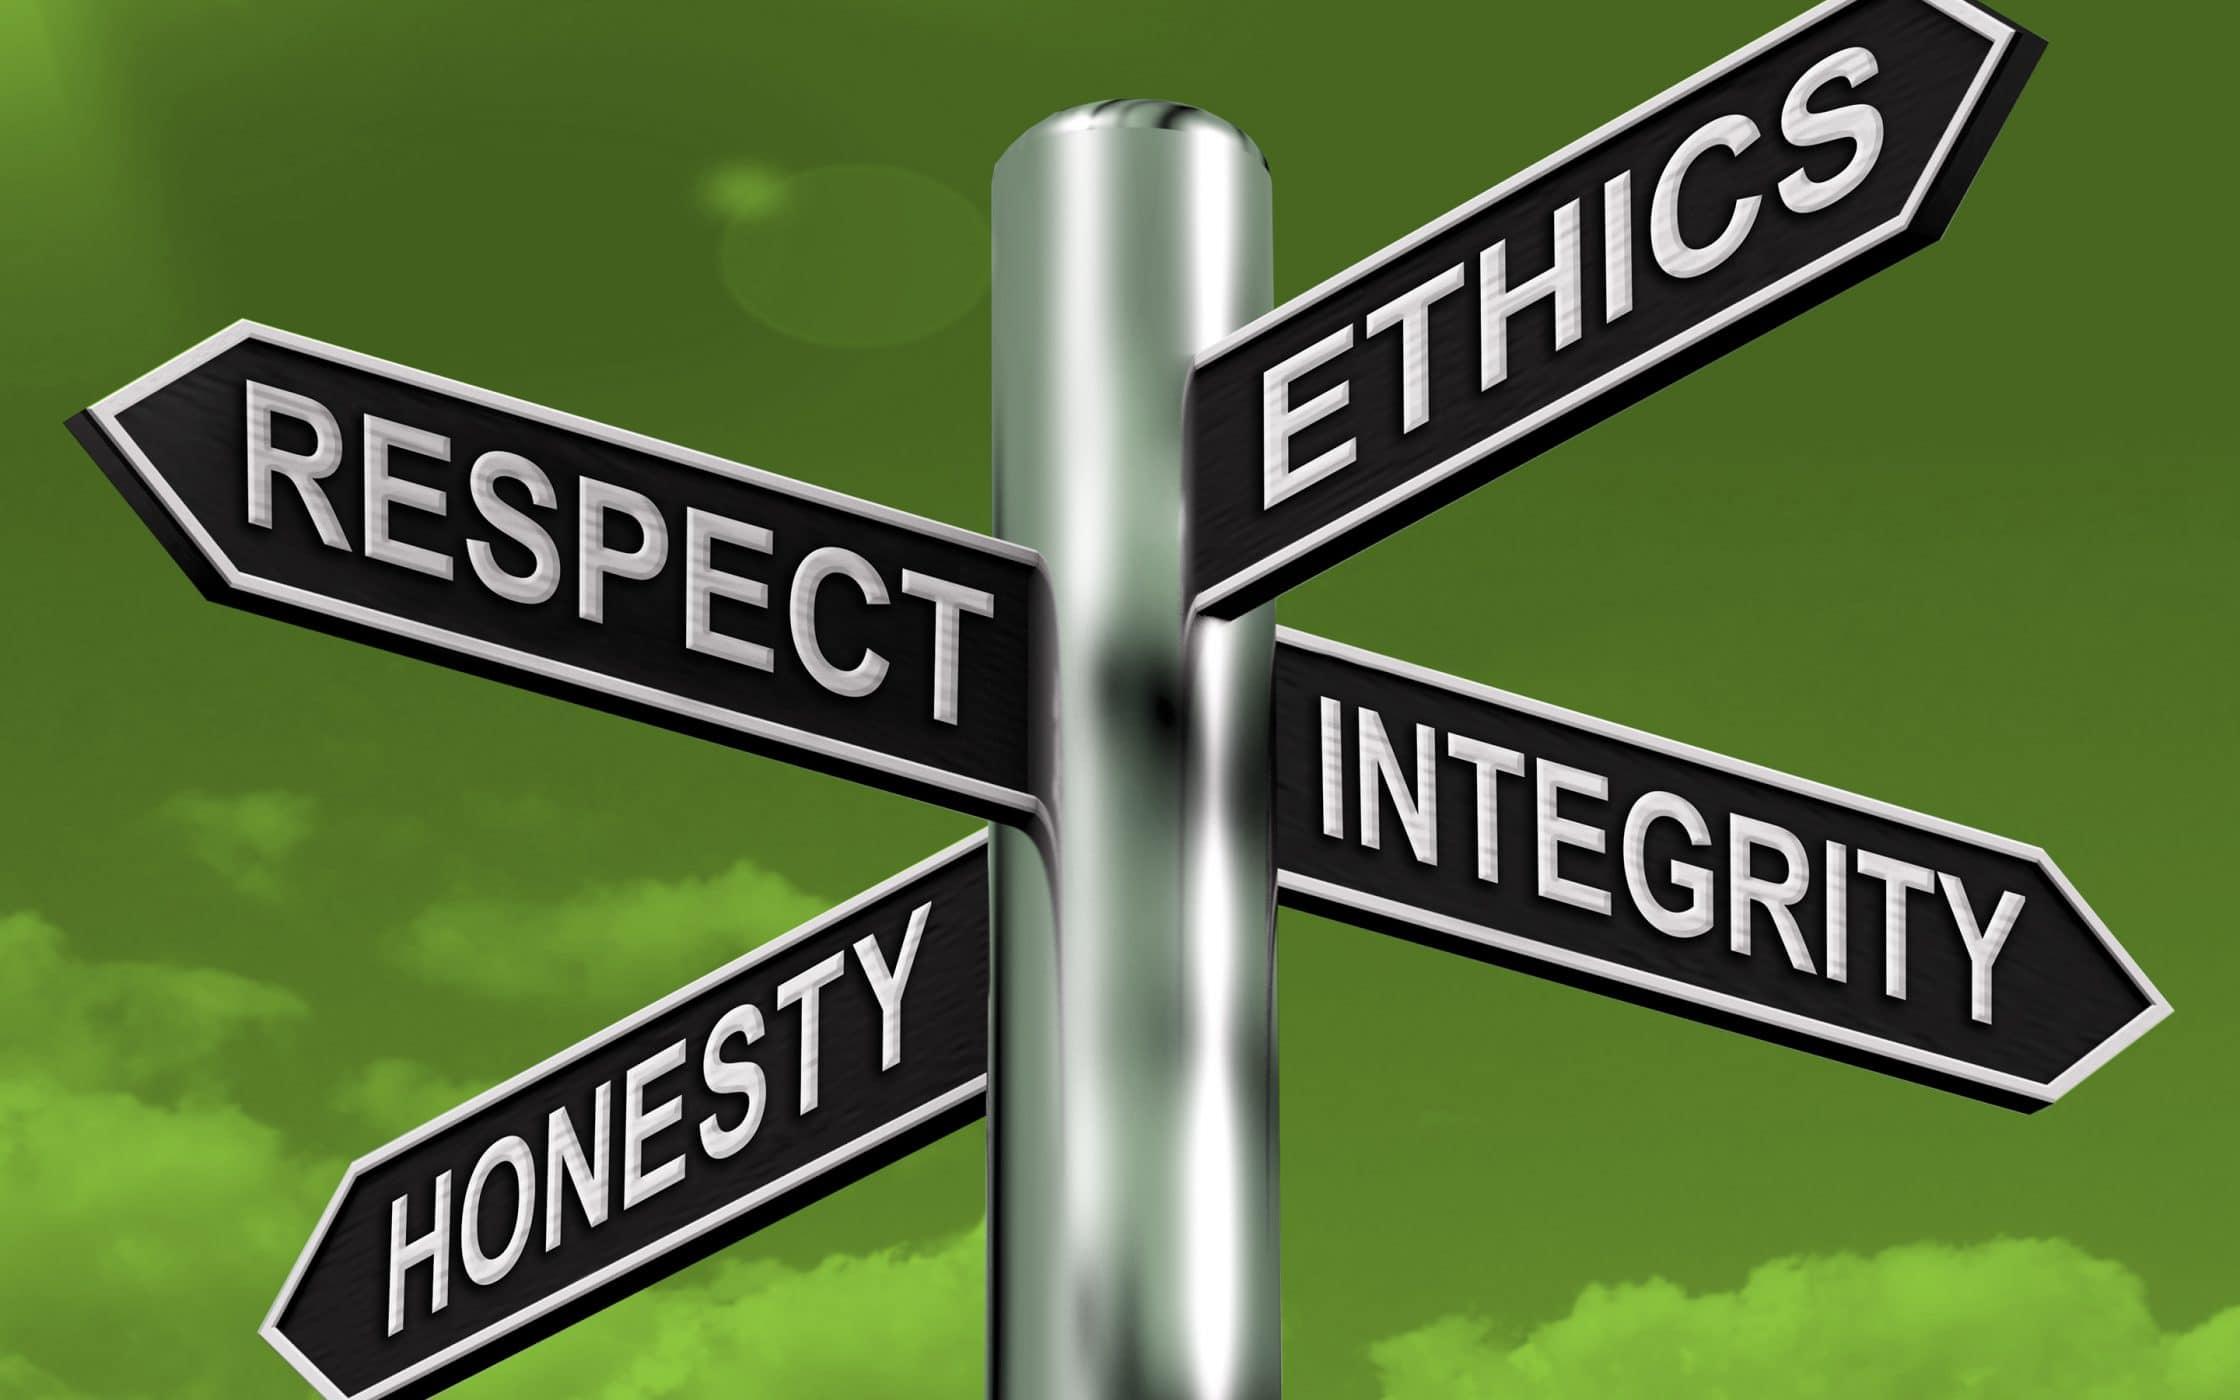 Brand Values